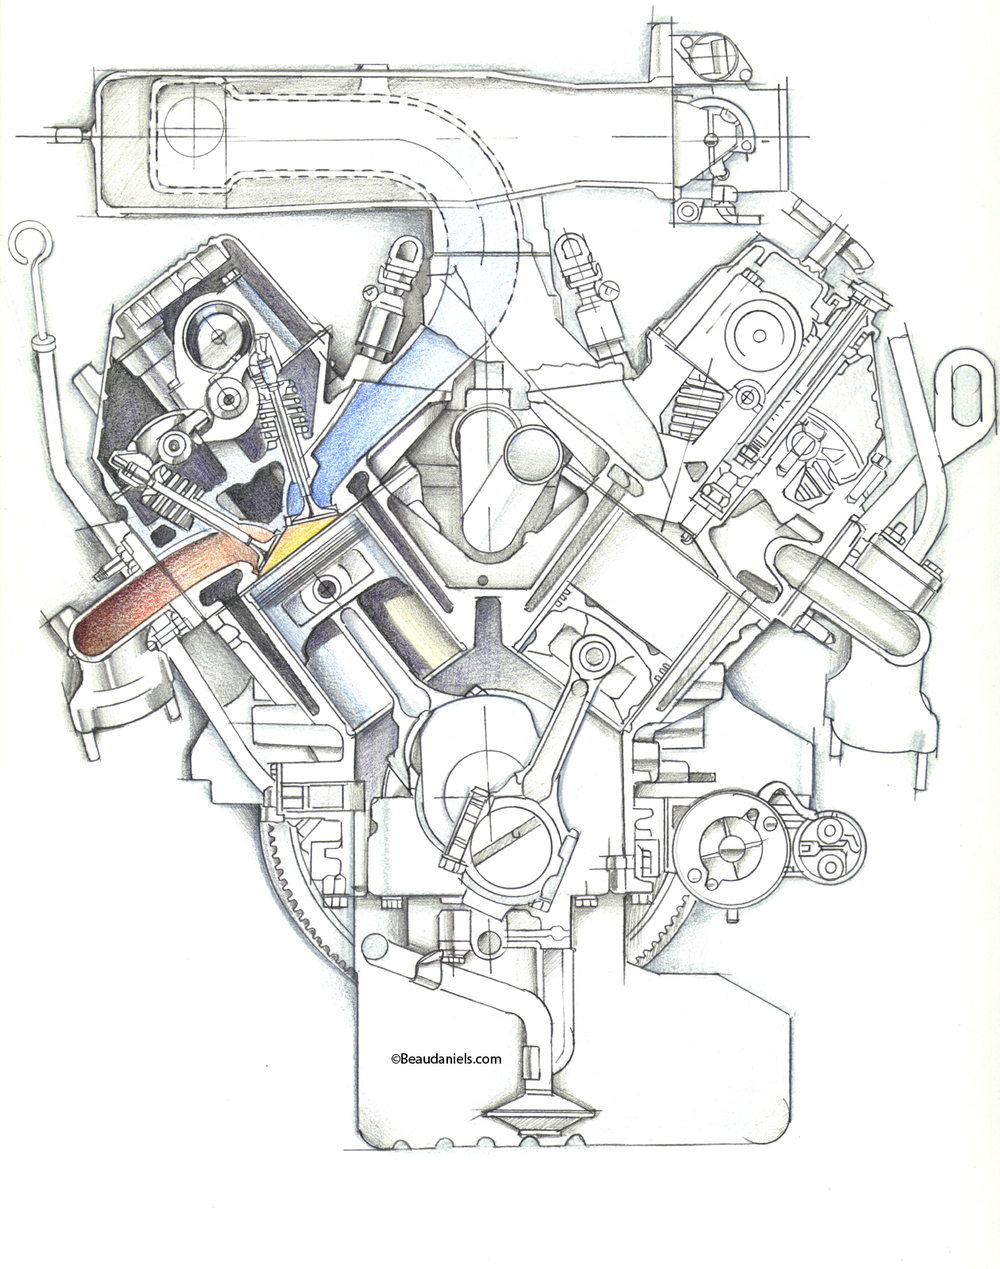 Beaudaniels Illustration